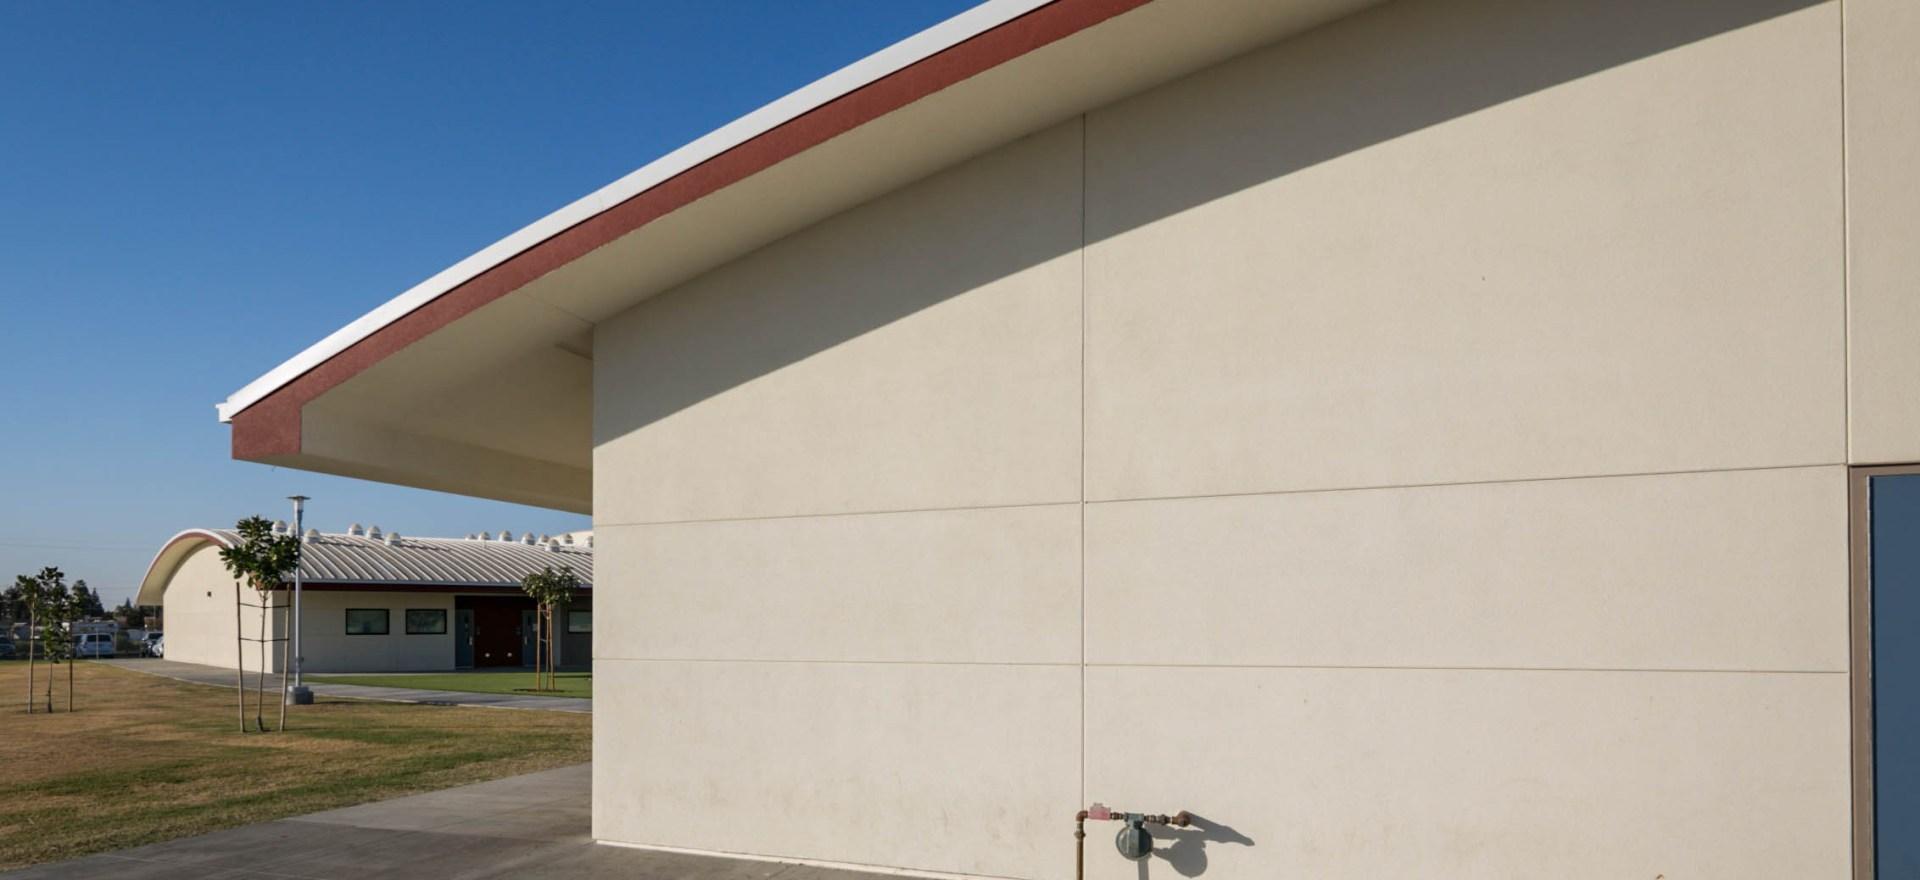 JTSModular-WhitleyElementarySchool-RobRijnenPhotography (20 of 36)